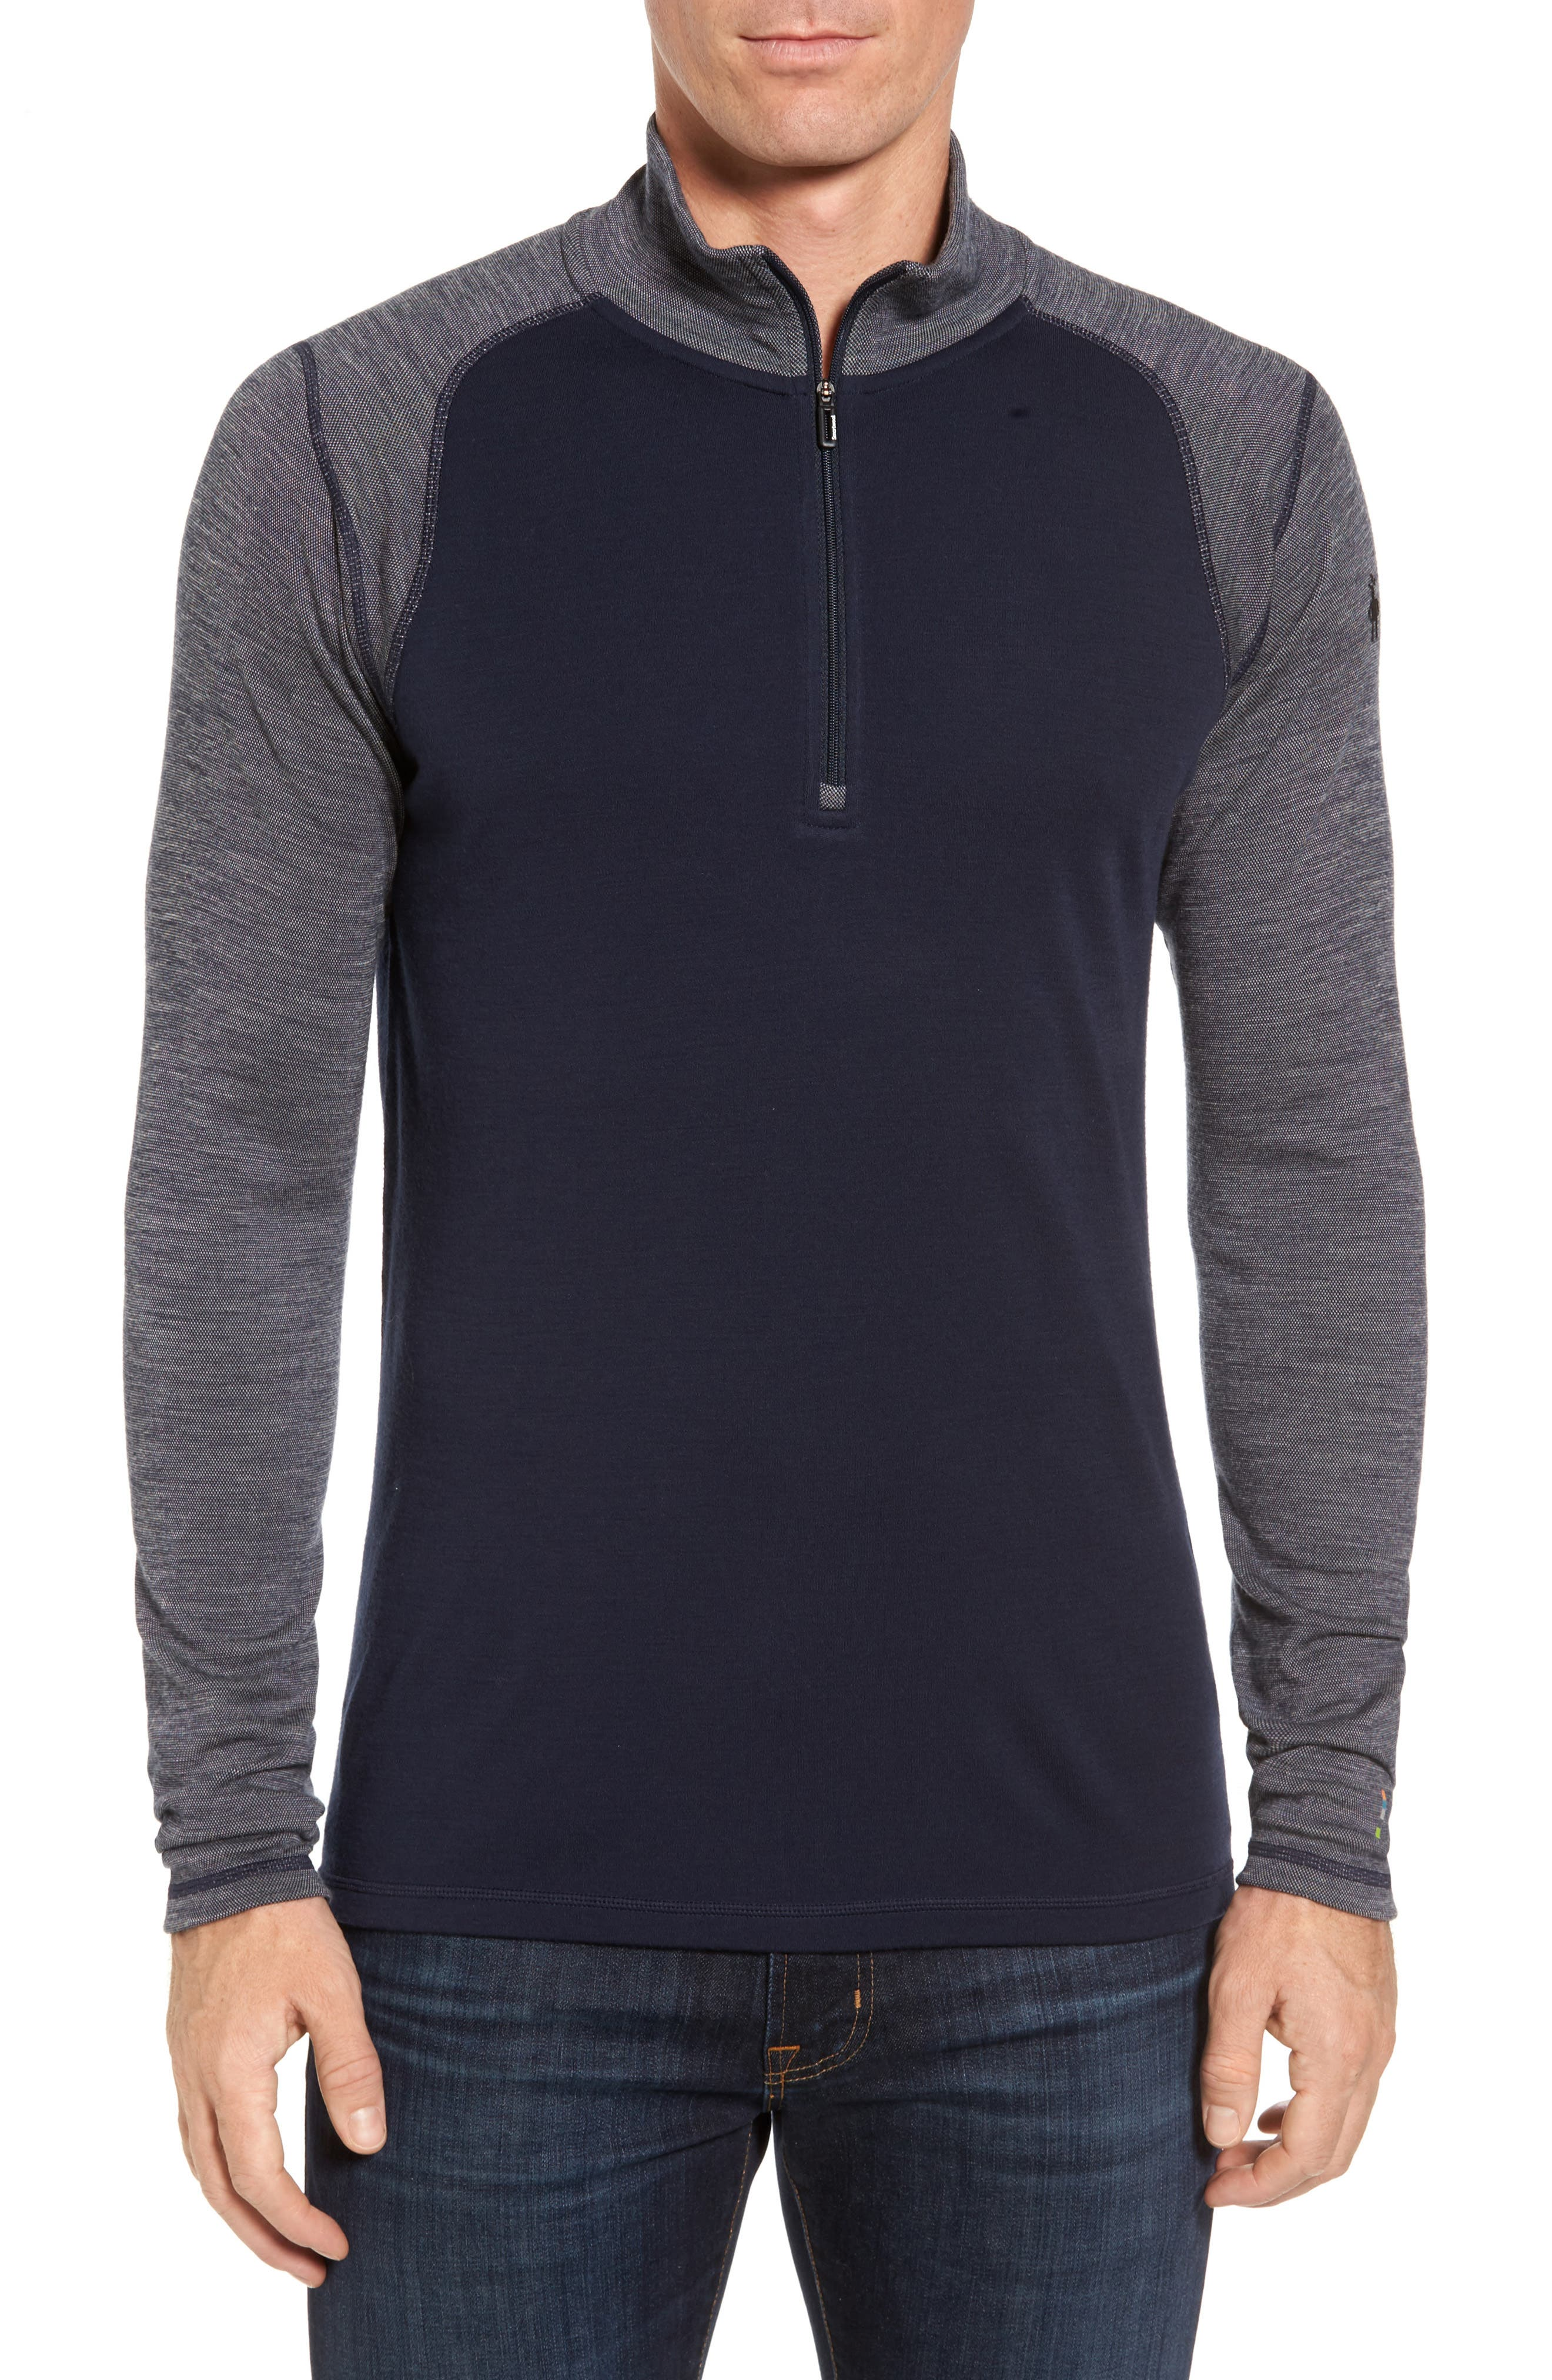 Merino 250 Base Layer Pattern Quarter Zip Pullover,                             Main thumbnail 1, color,                             Deep Navy/ Winter White